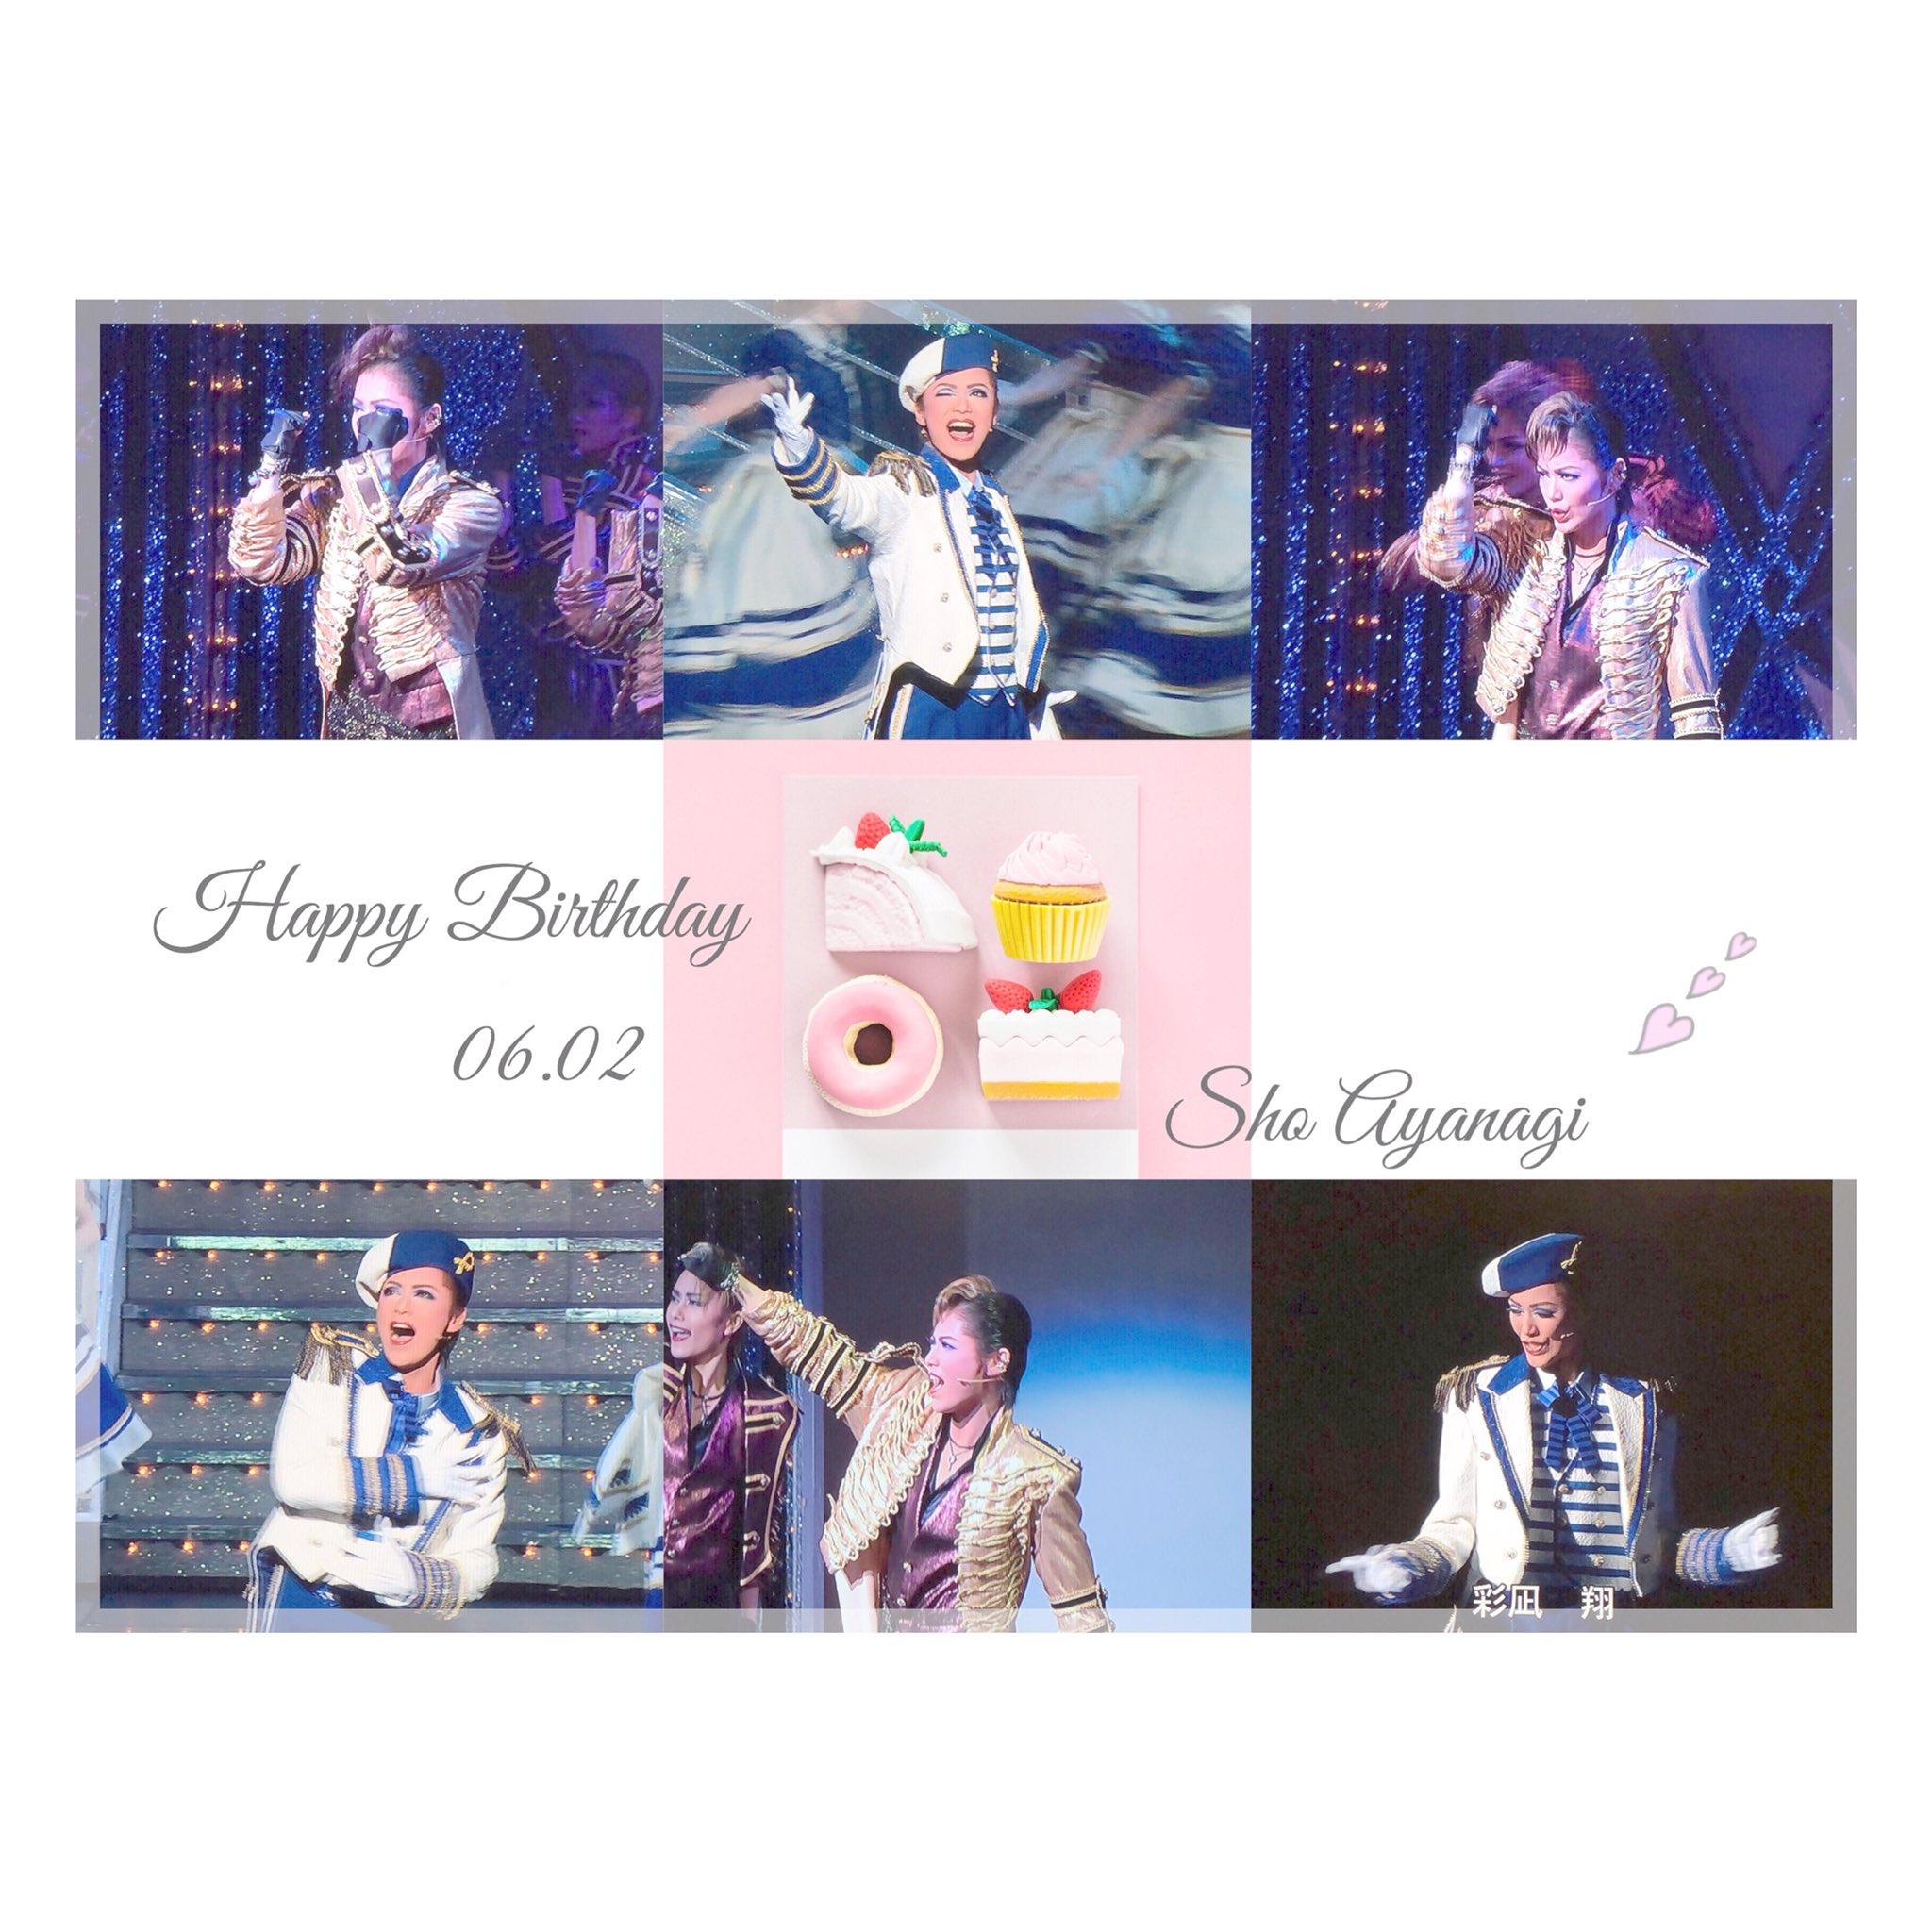 Happy Birthday  *:.  0602 Sho Ayanagi